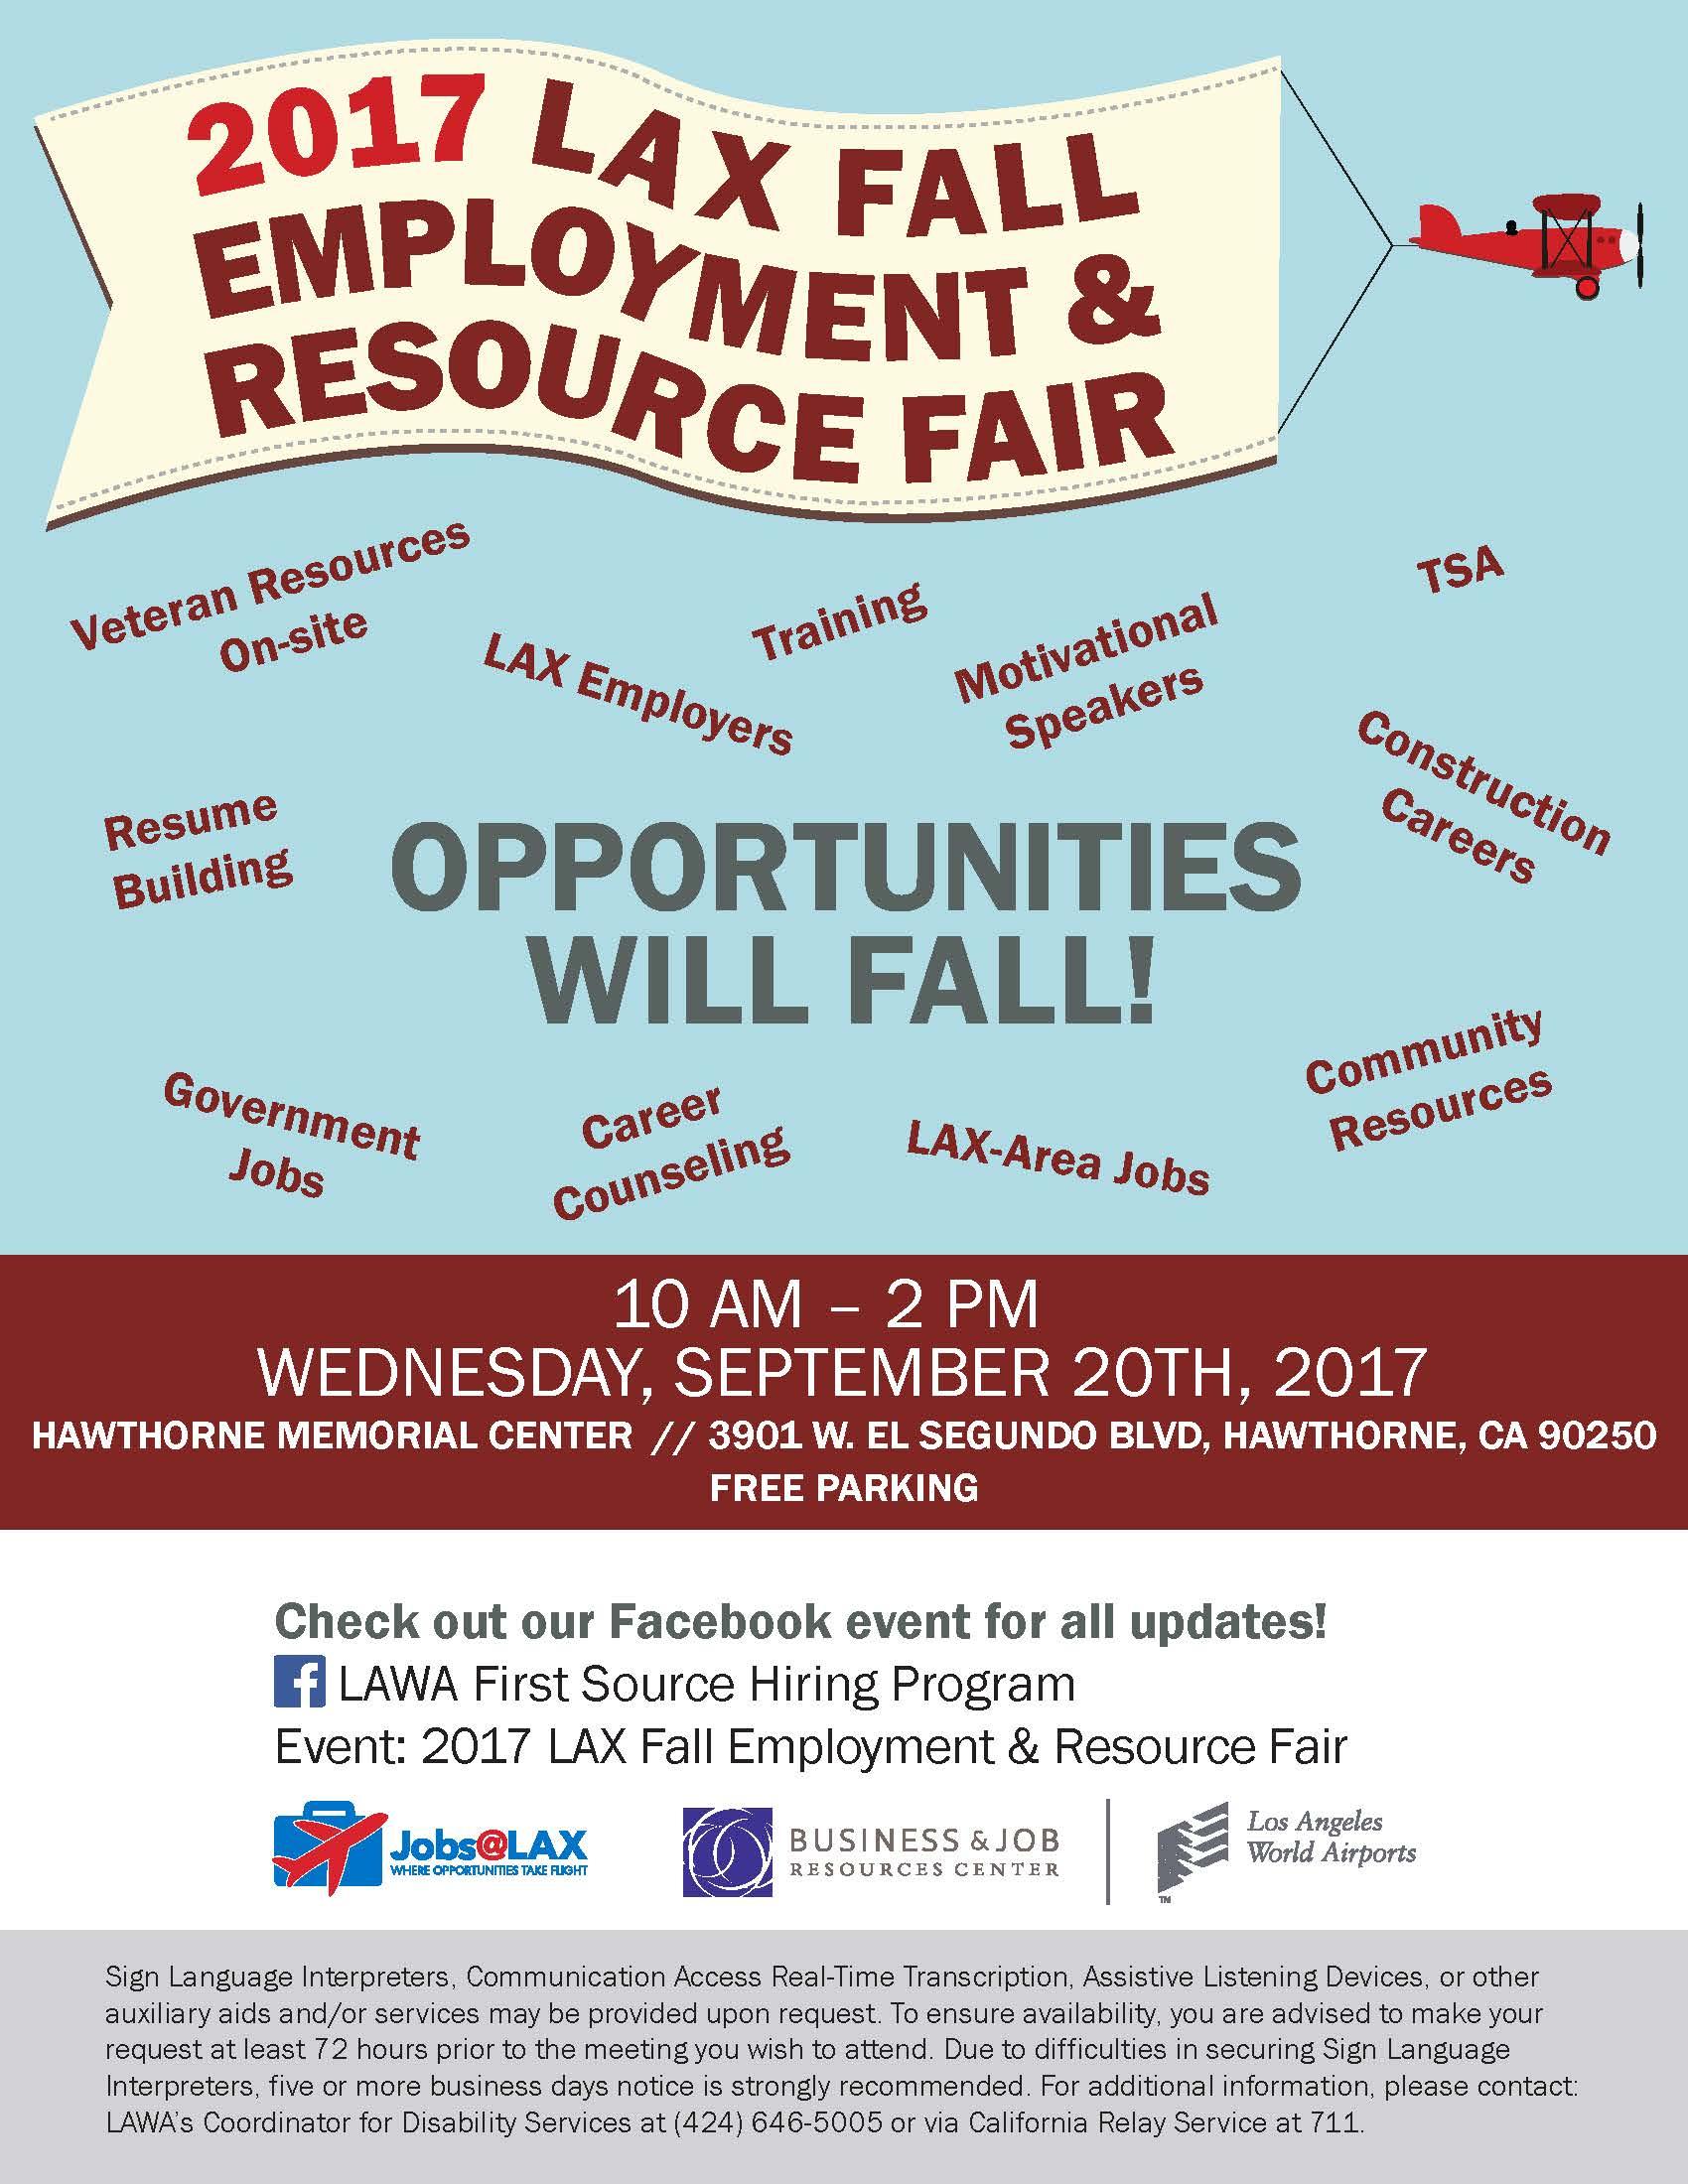 2017 LAX Fall Employment & Resource Fair